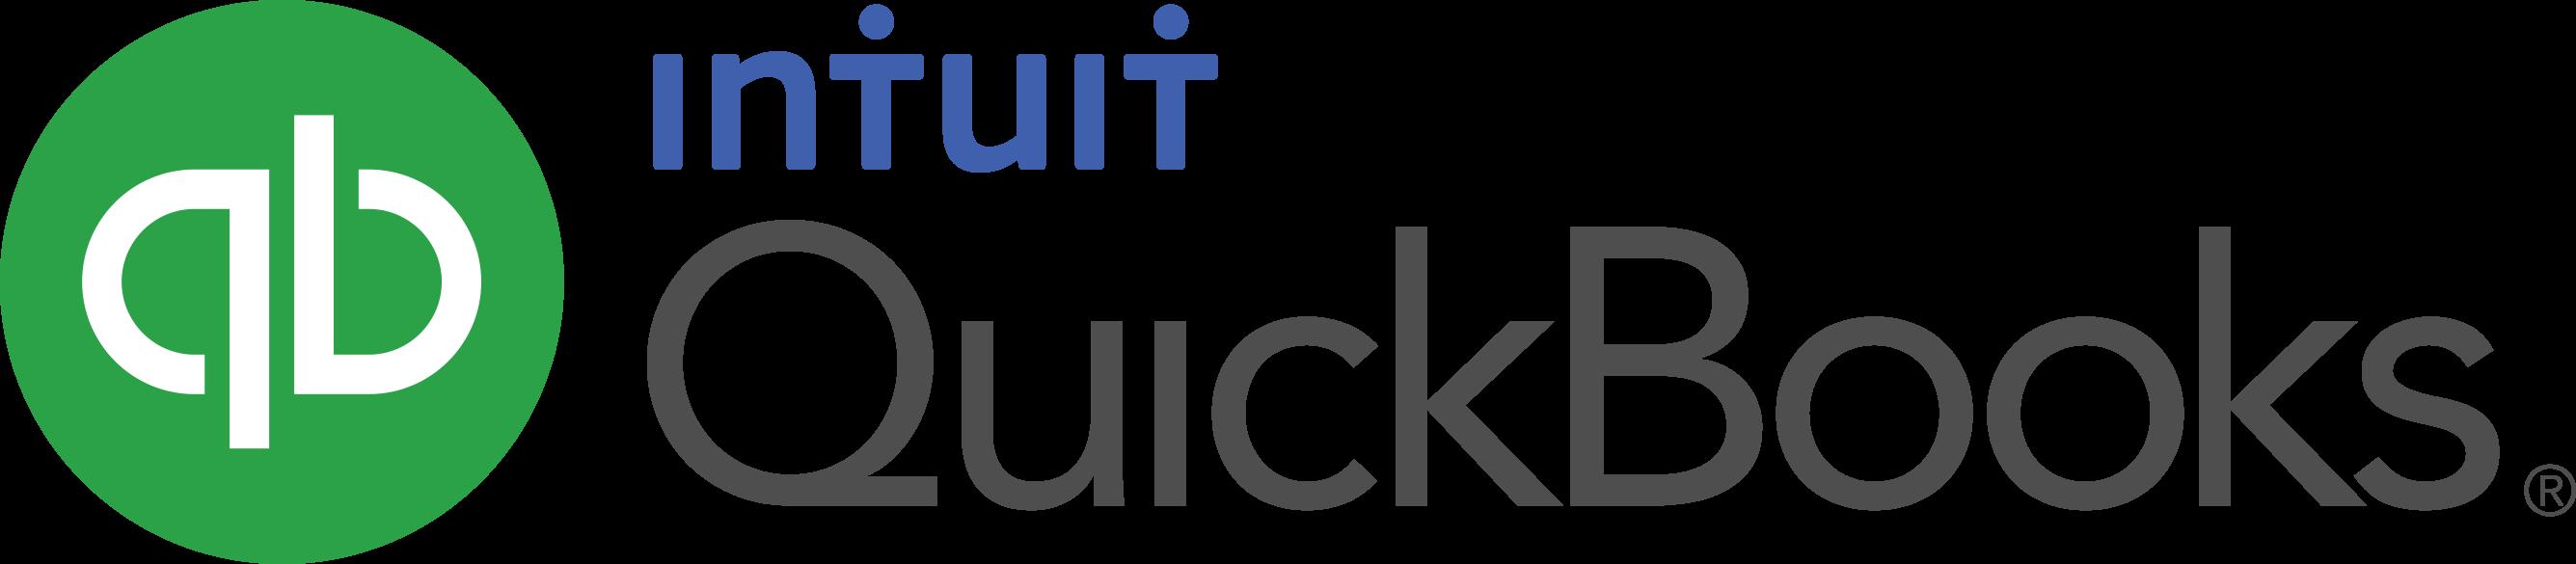 quickbooks onemint partner network